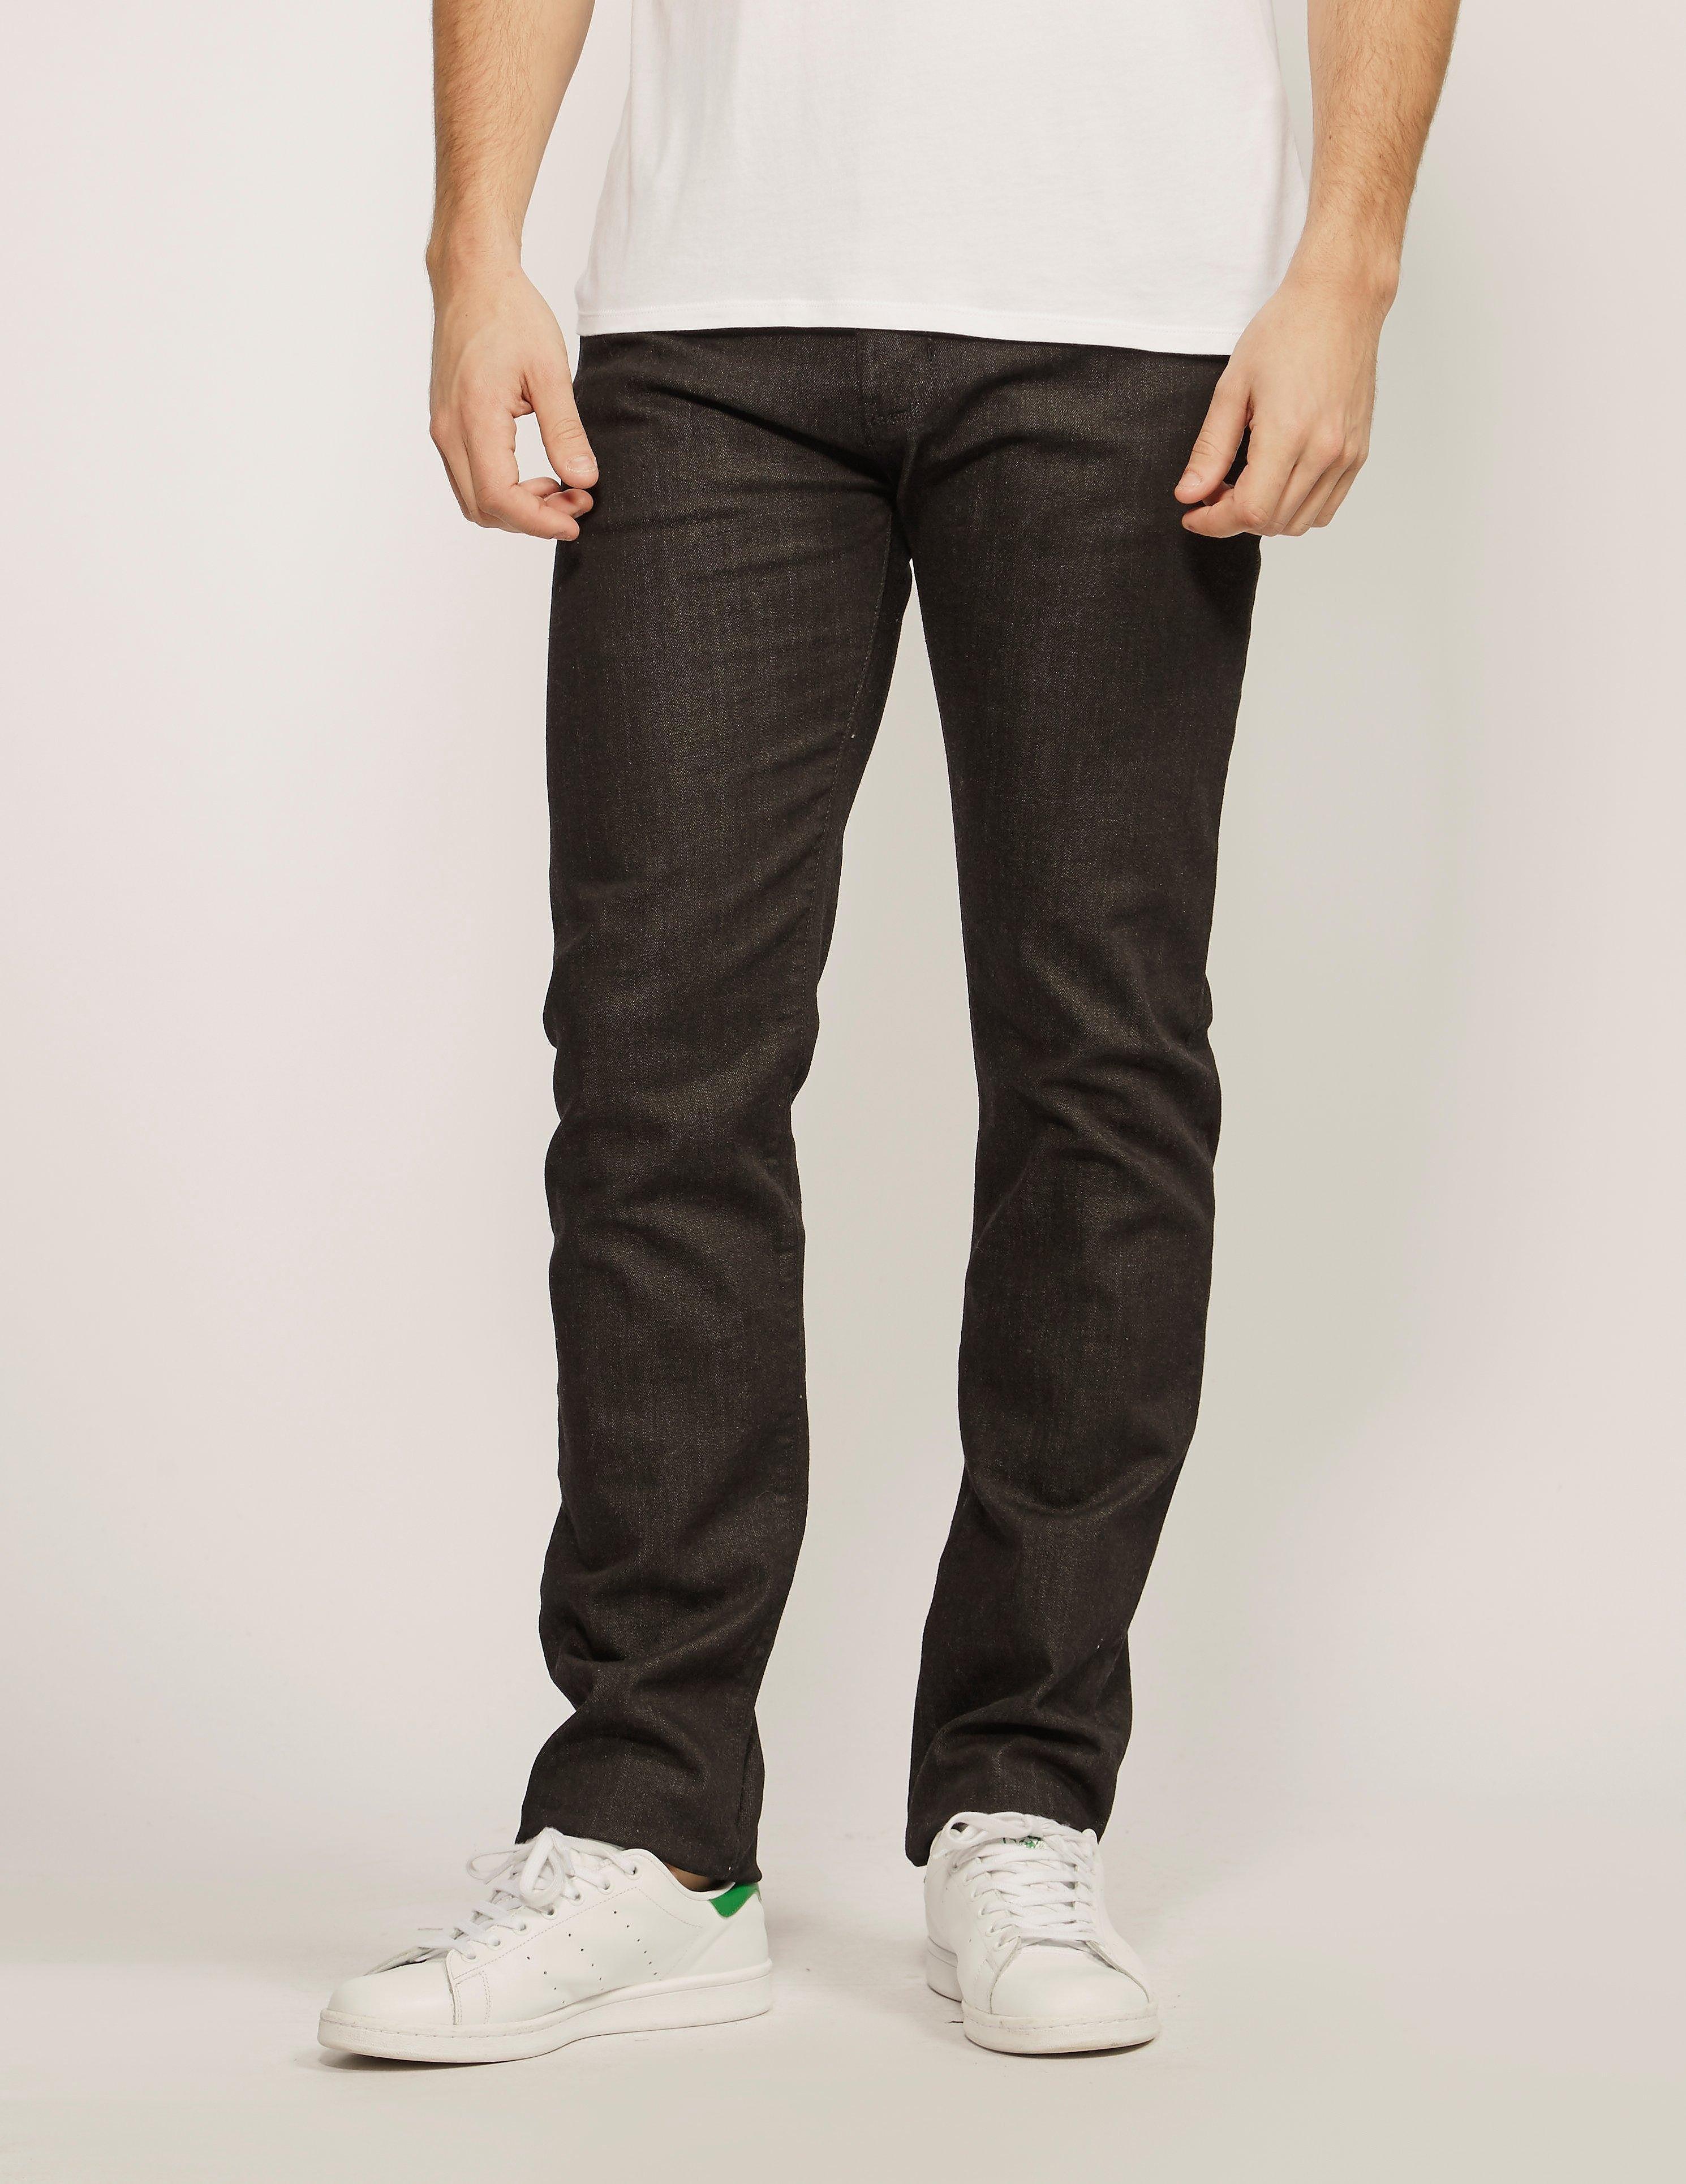 Armani Jeans J45 Bull Denim Regular Fit Jeans - Long